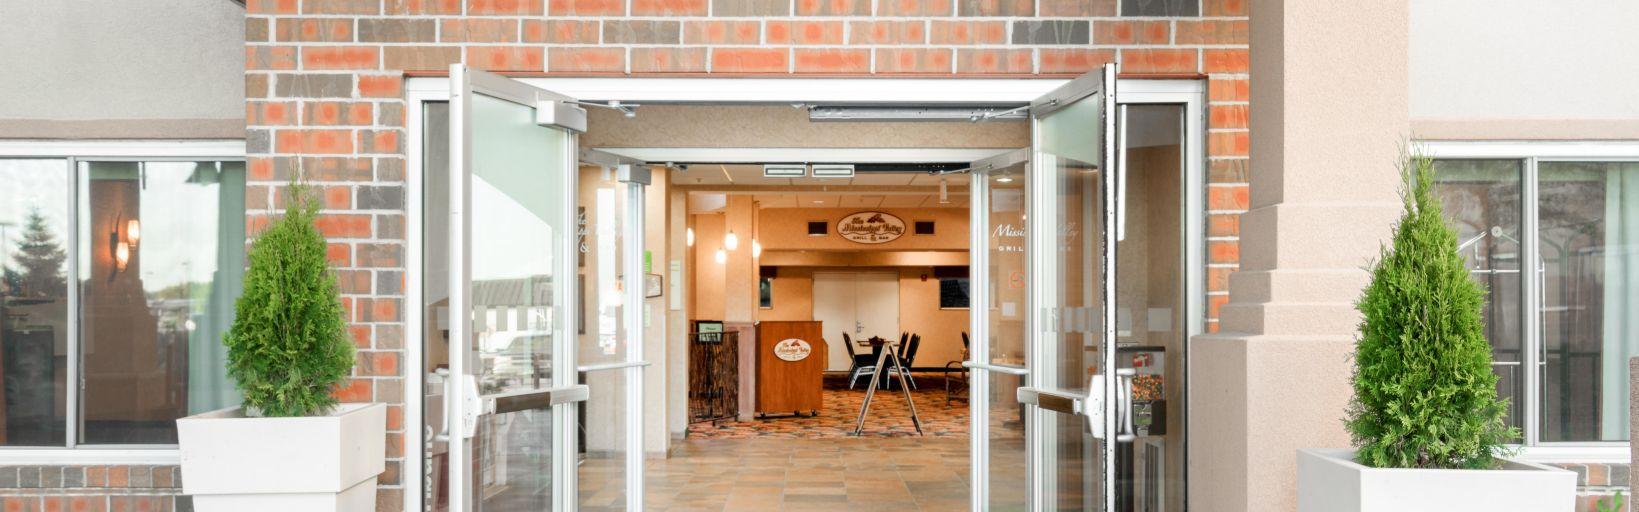 Entrance Hotel